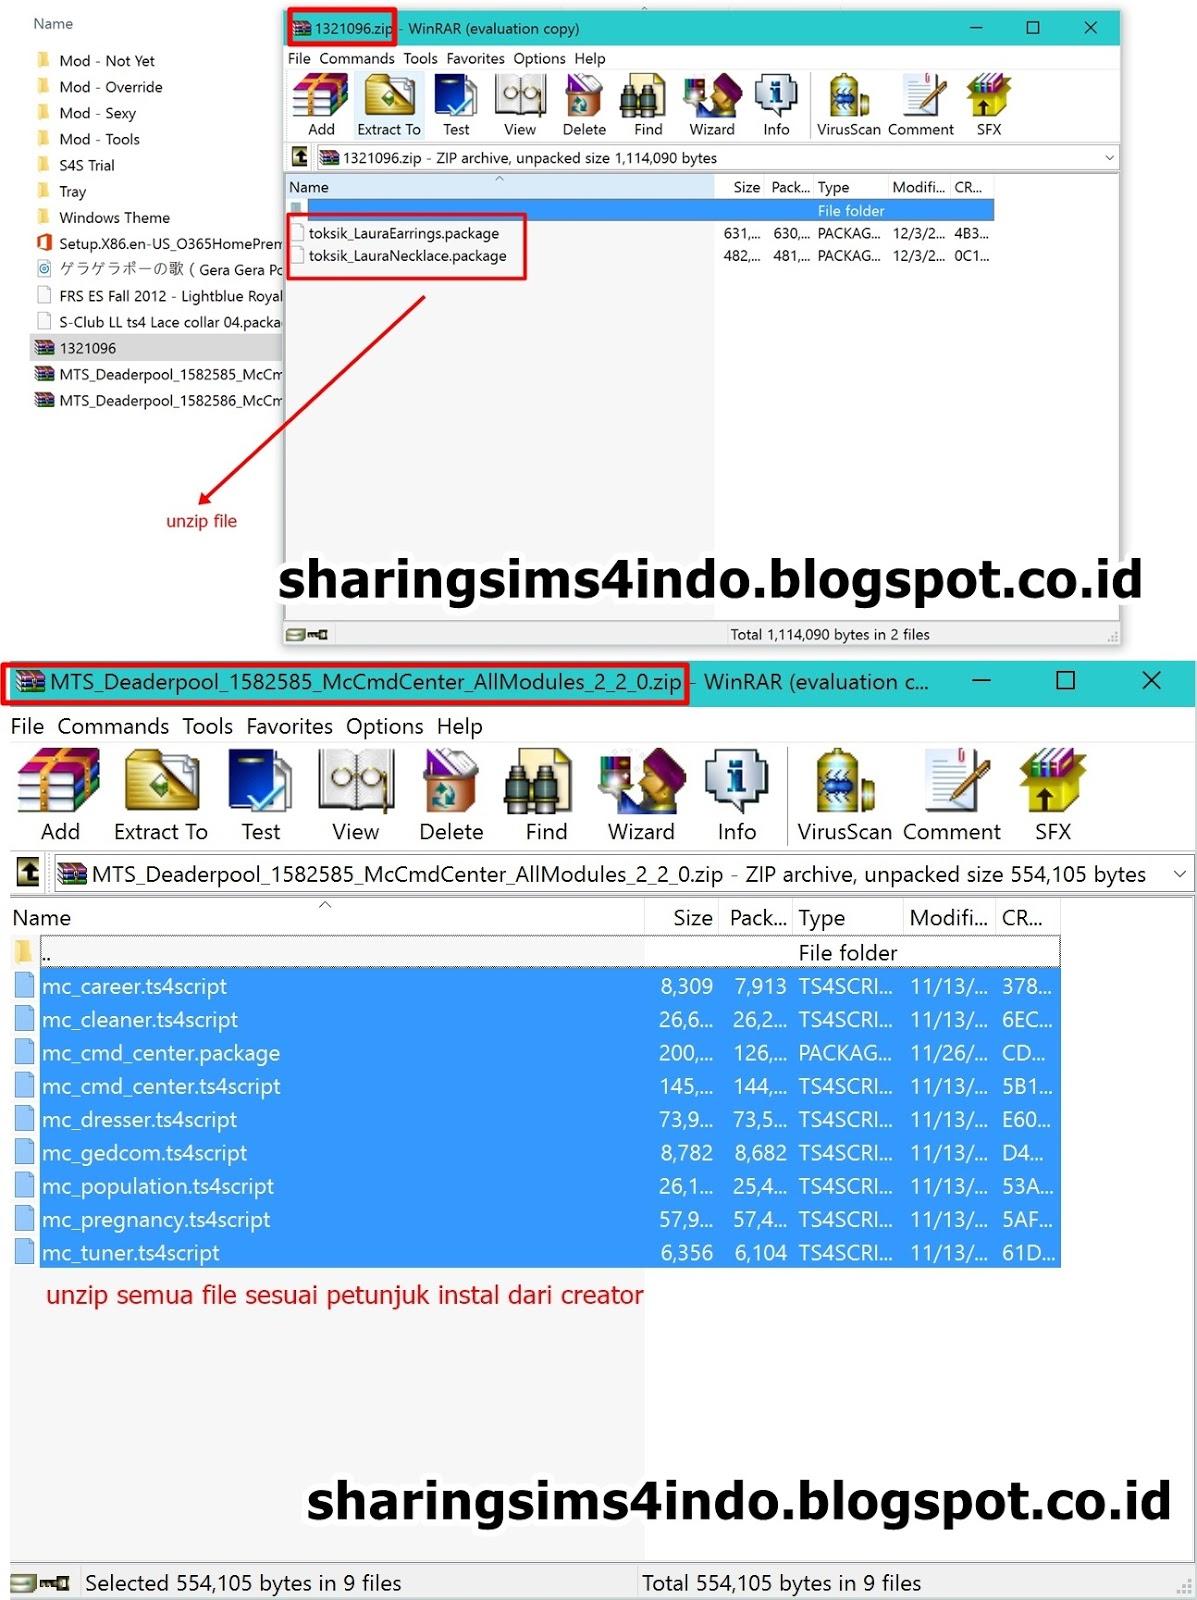 Cara Menginstal Mod dan CC Per Langkah | SharingSims4Indo